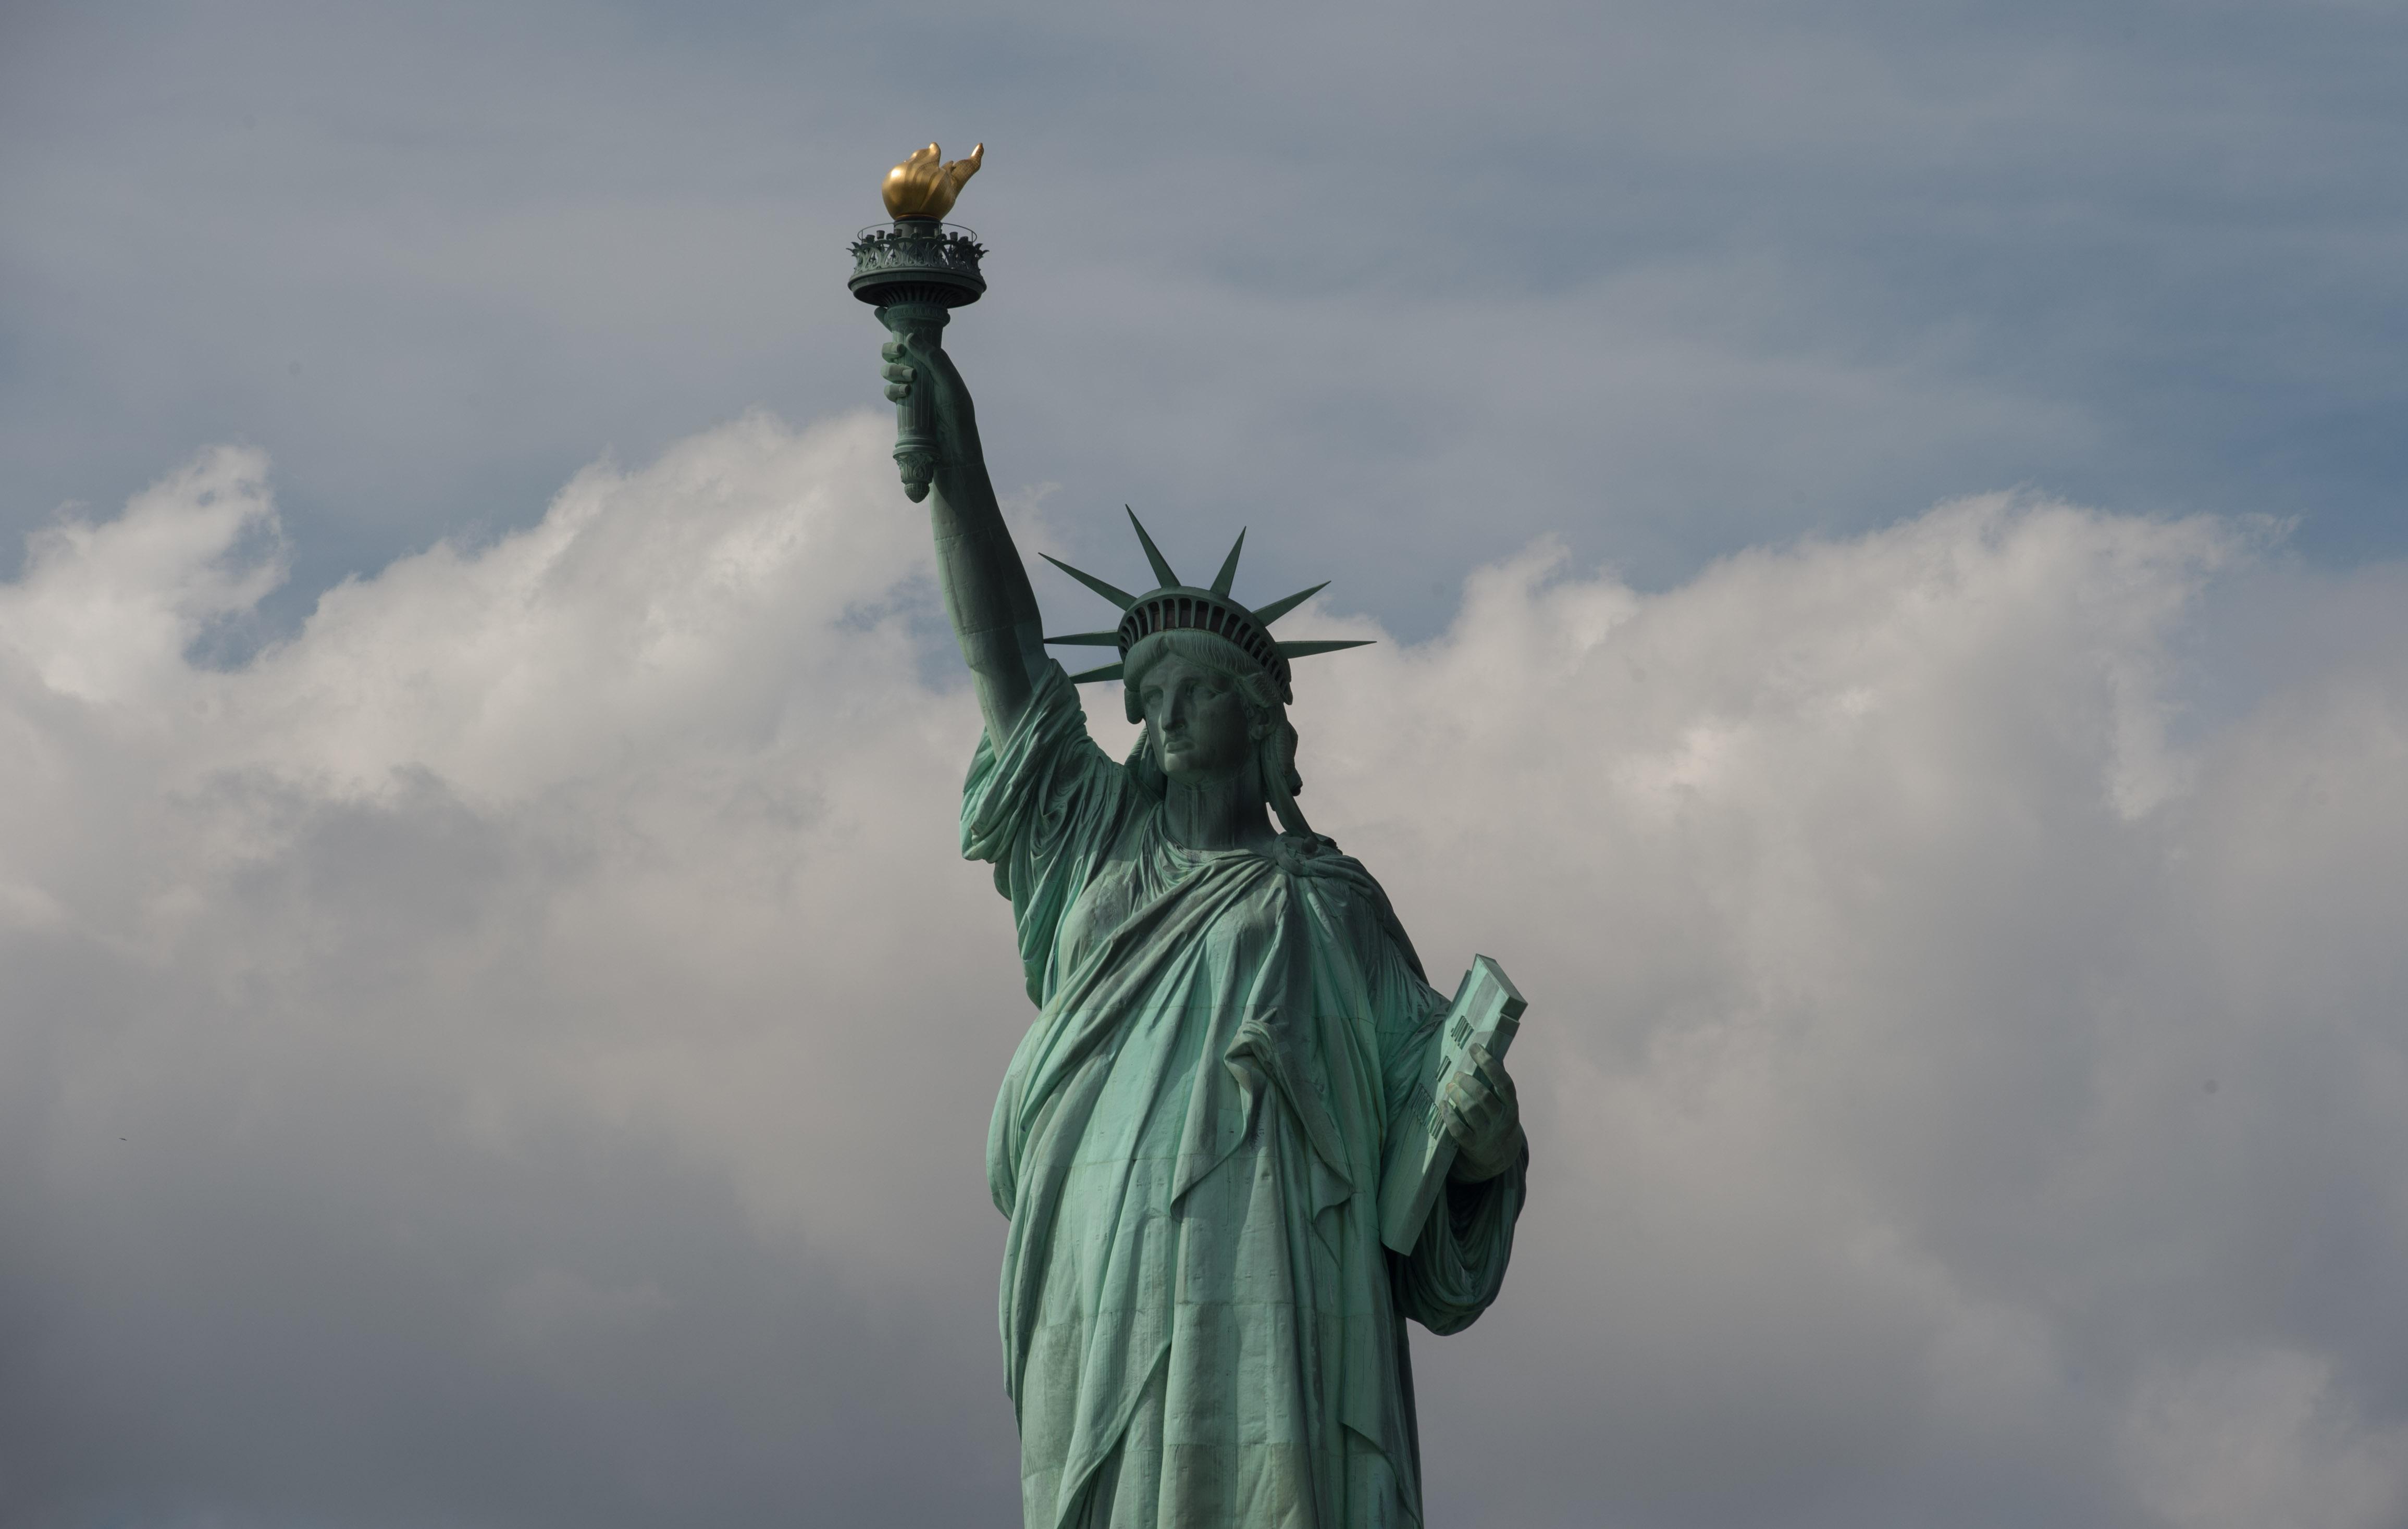 US-LANDMARKS-STATUE OF LIBERTY